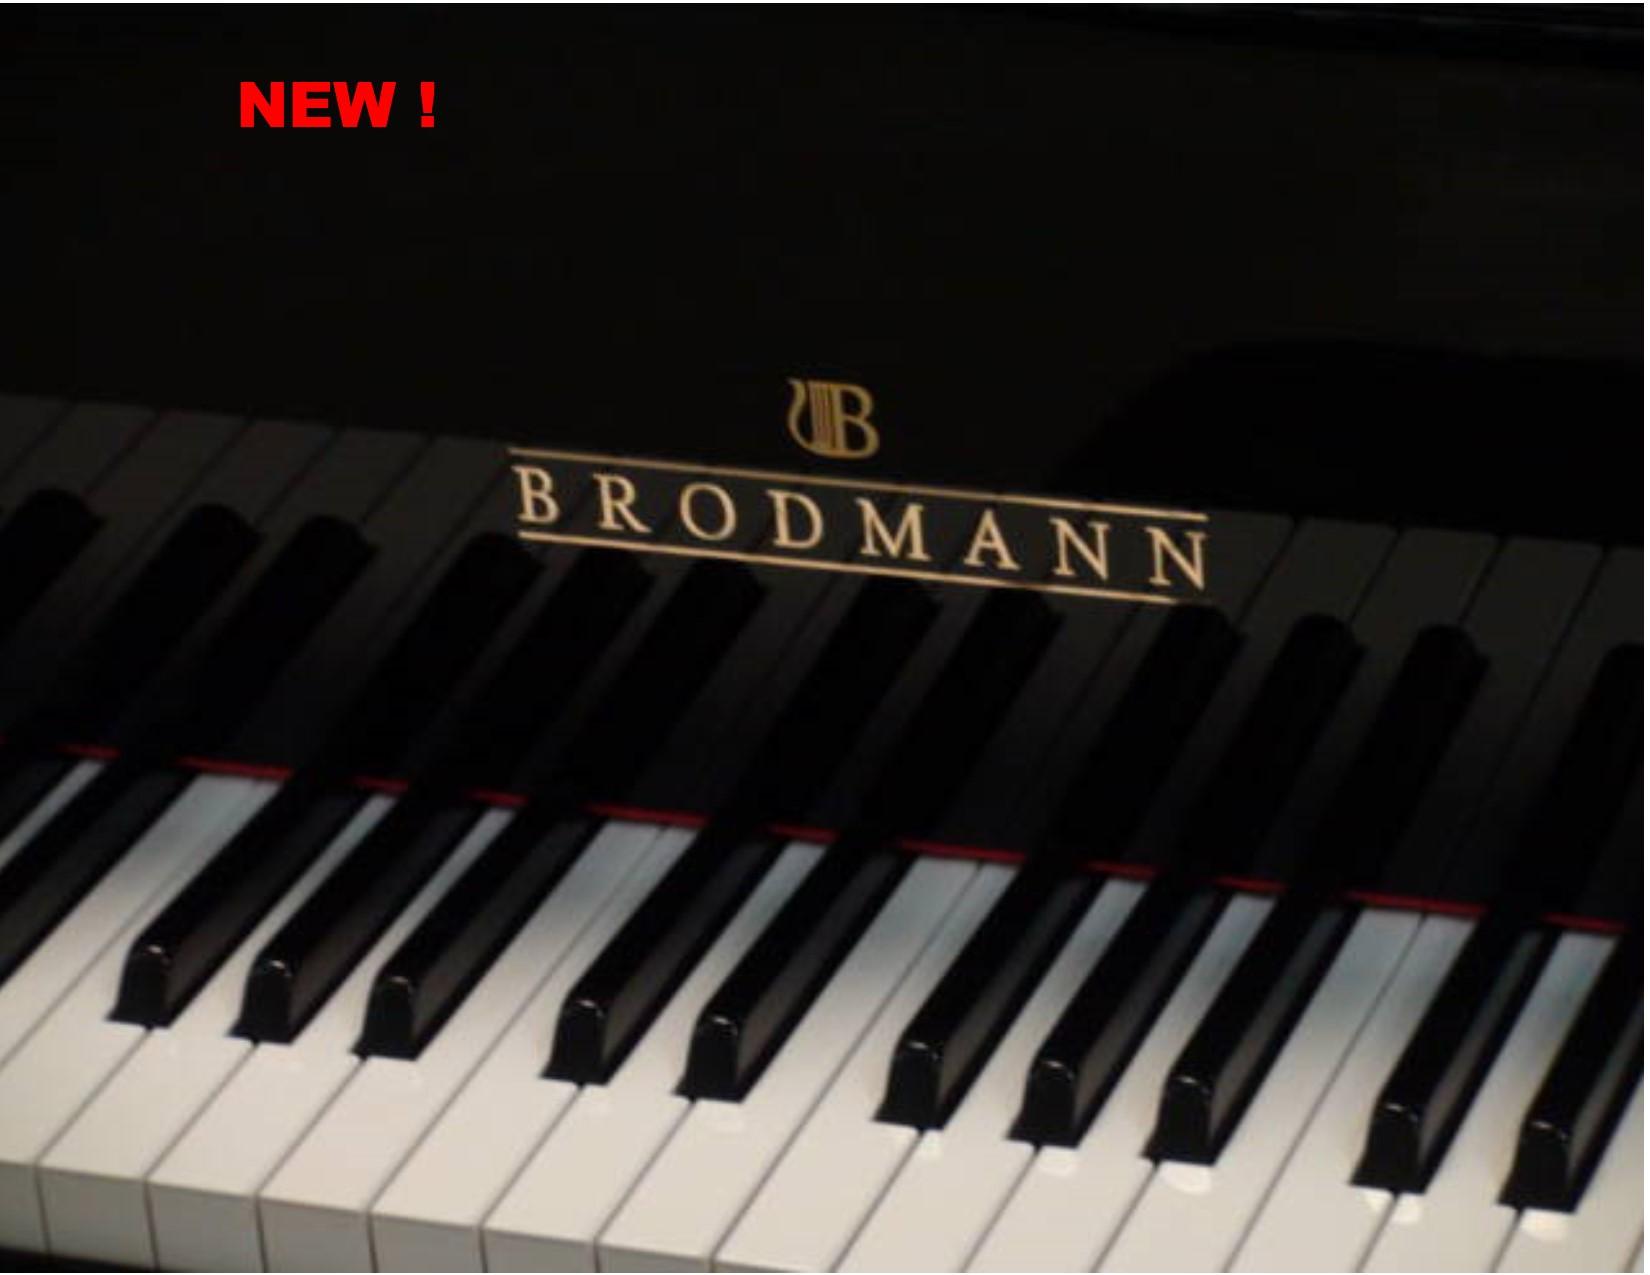 "12364-<br><font color=black><b>NEW BRODMANN</b></font> 7'0″ SEMI-CONCERT GRAND <br>•Built in Germany<br> •European Tradition<br> •European Sound <br><font color=blue><b>Click Picture for ""Live Video""</b></font> <br>"